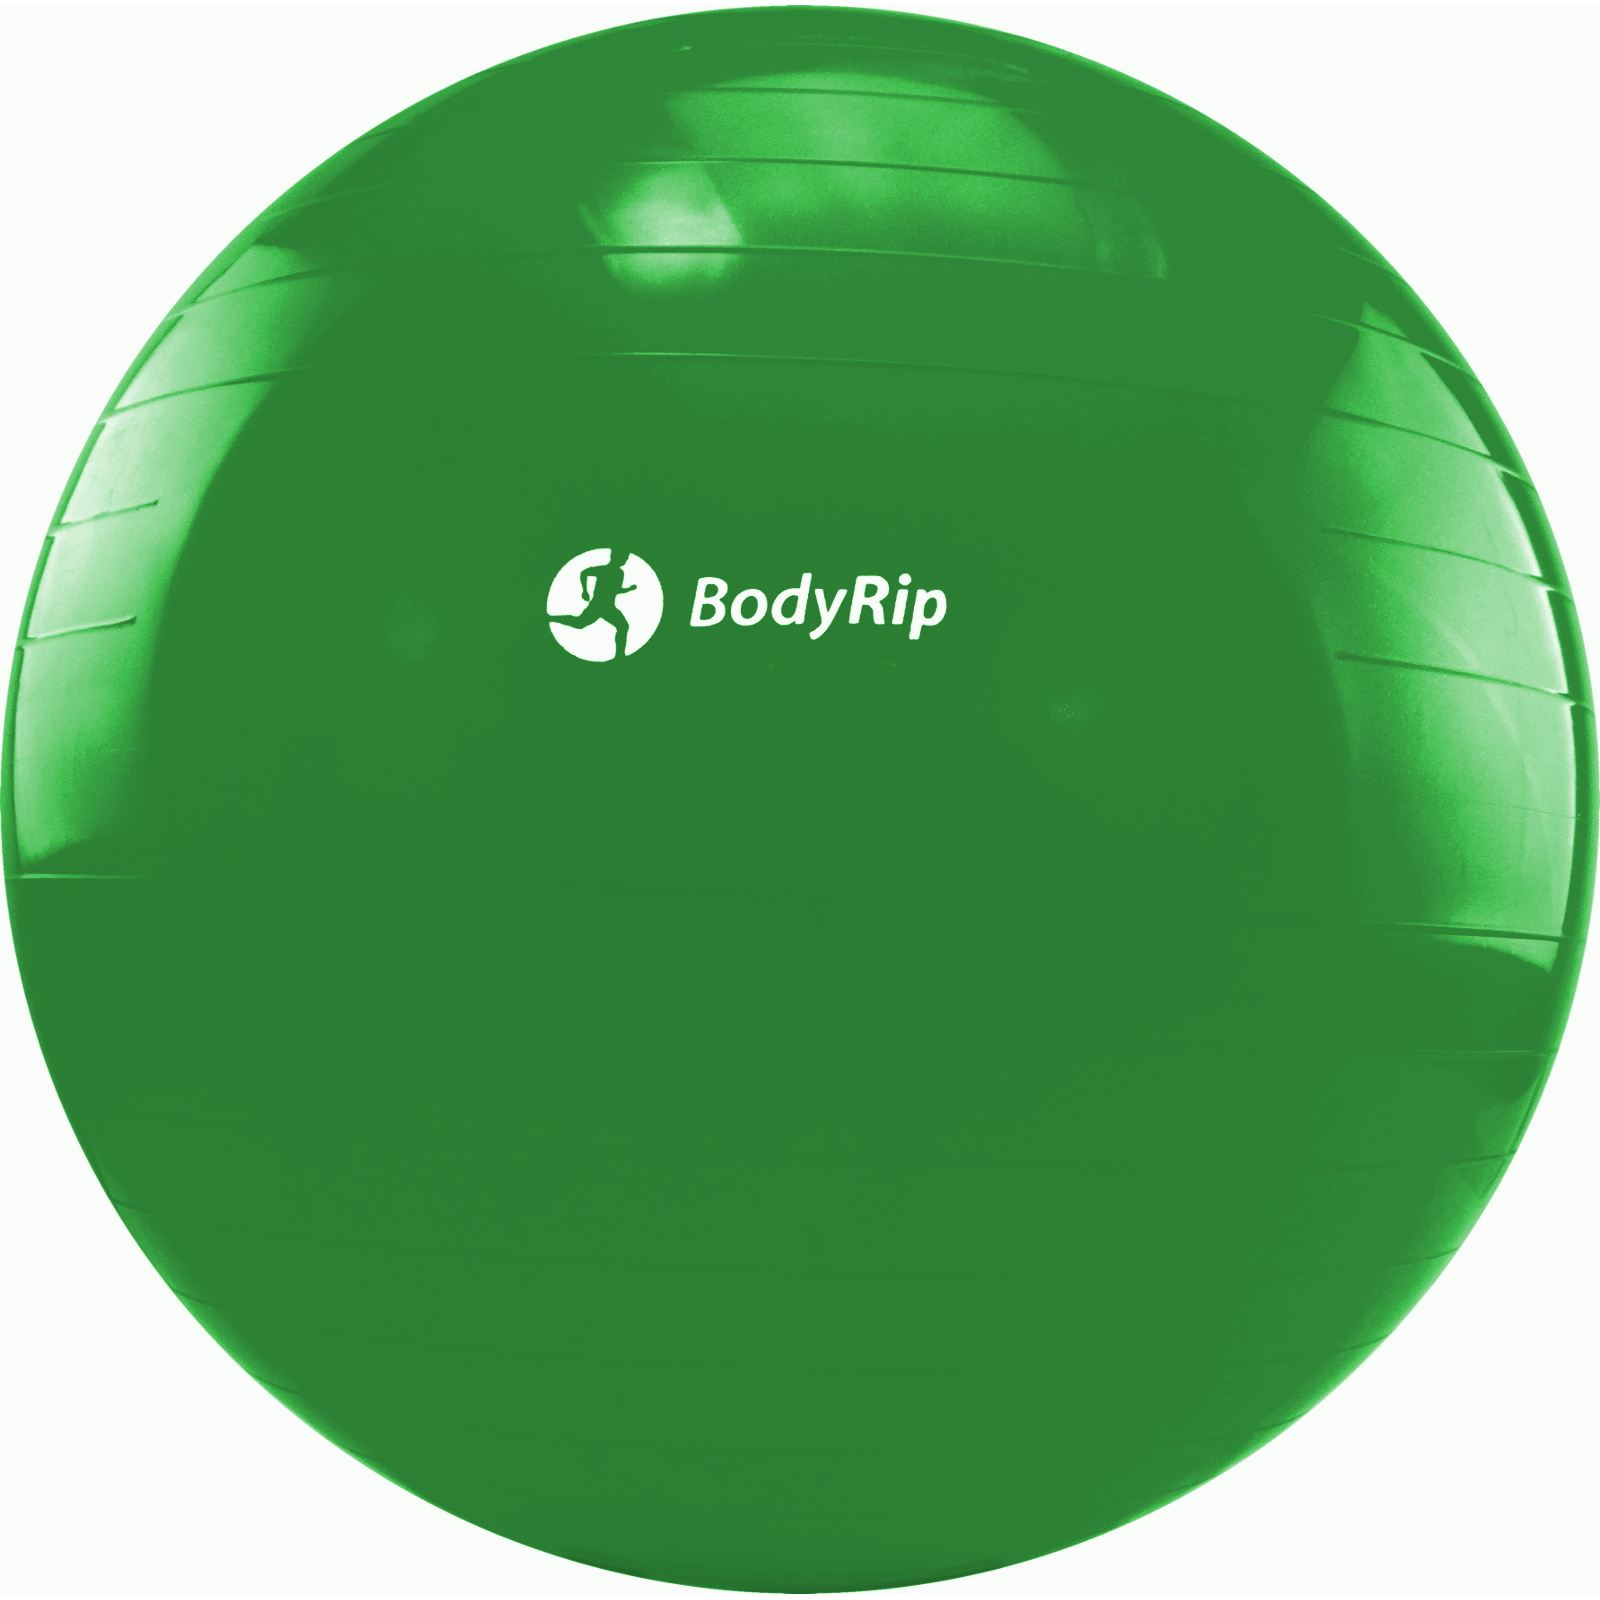 Balance Ball For Weight Loss: BODYRIP EXERCISE GYM YOGA SWISS 65cm BALL FITNESS AB